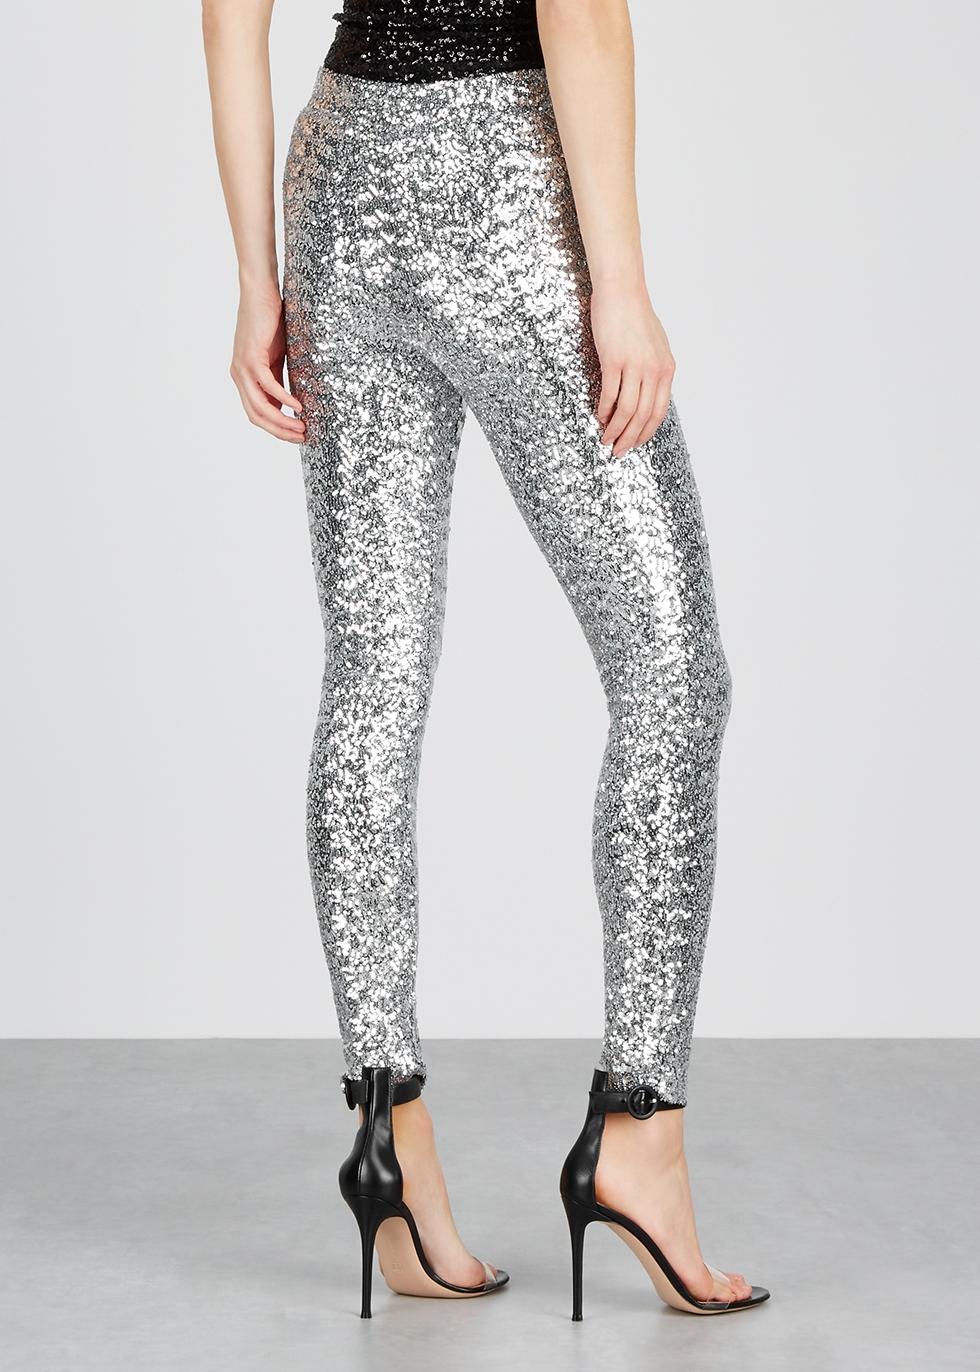 Odiz silver sequin trousers - Isabel Marant